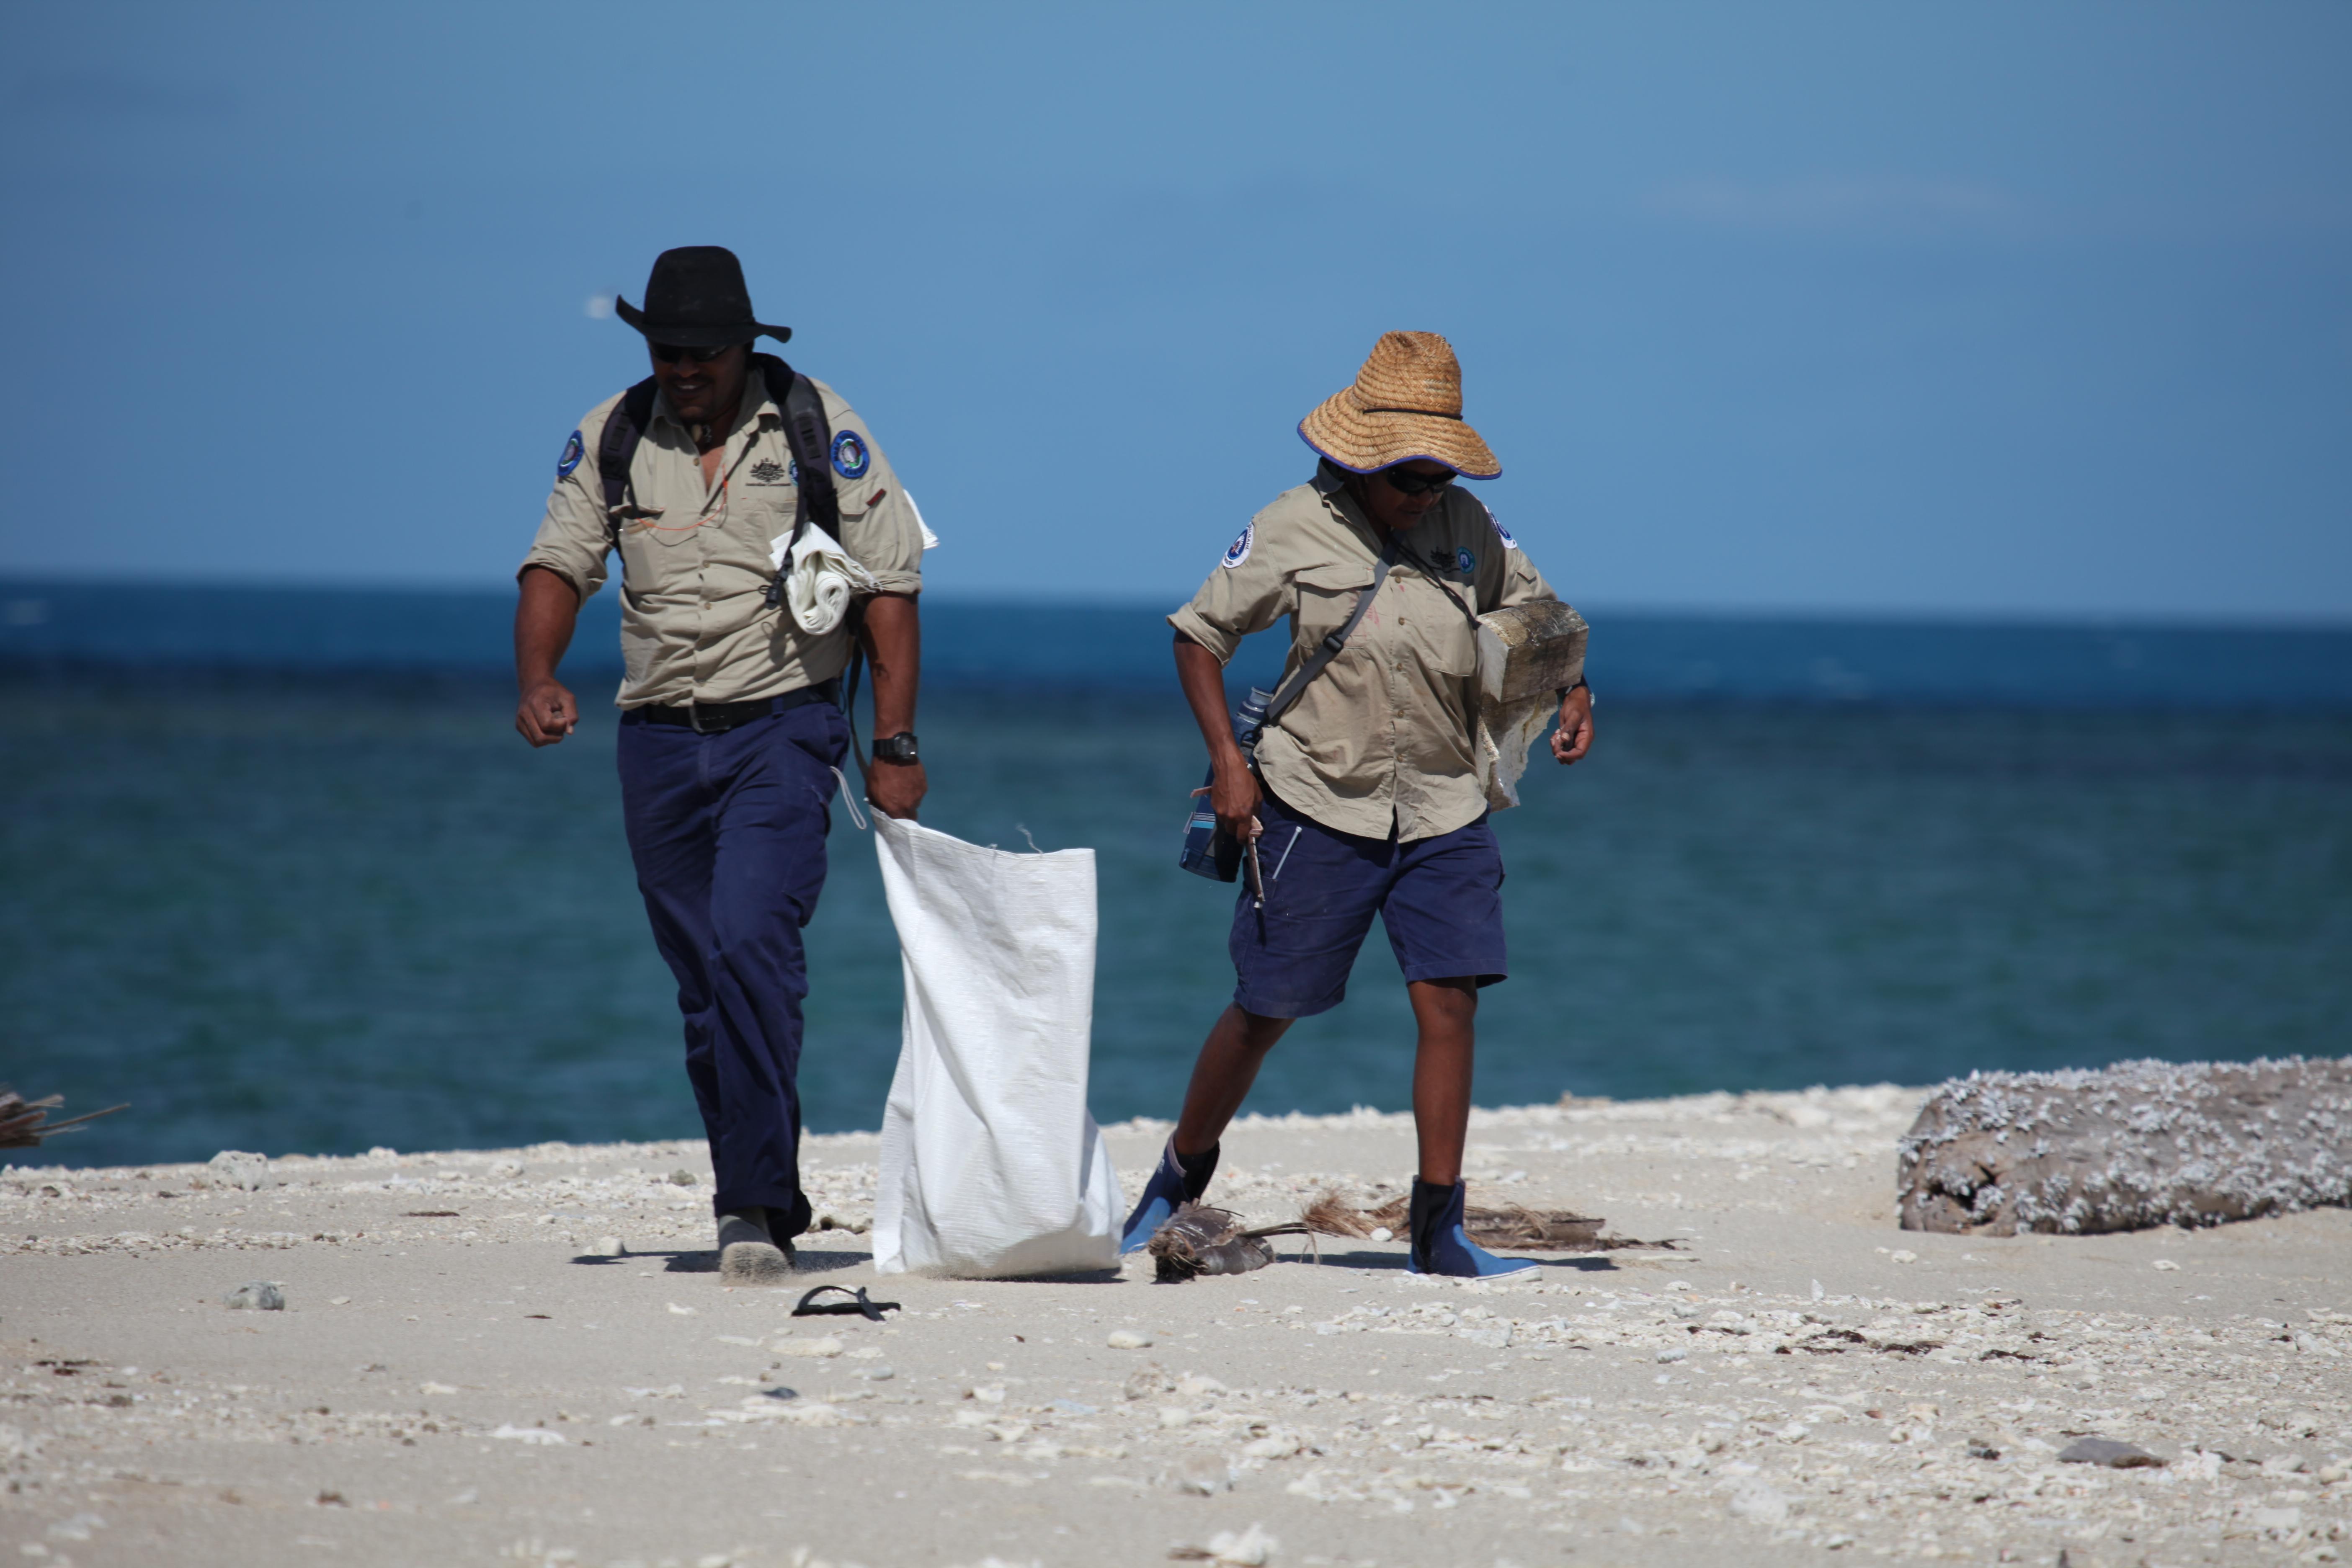 Copy_of_Rangers_on_uninhabited_isalnd_beach_clean-up_credit_Matt_Dunn.JPG